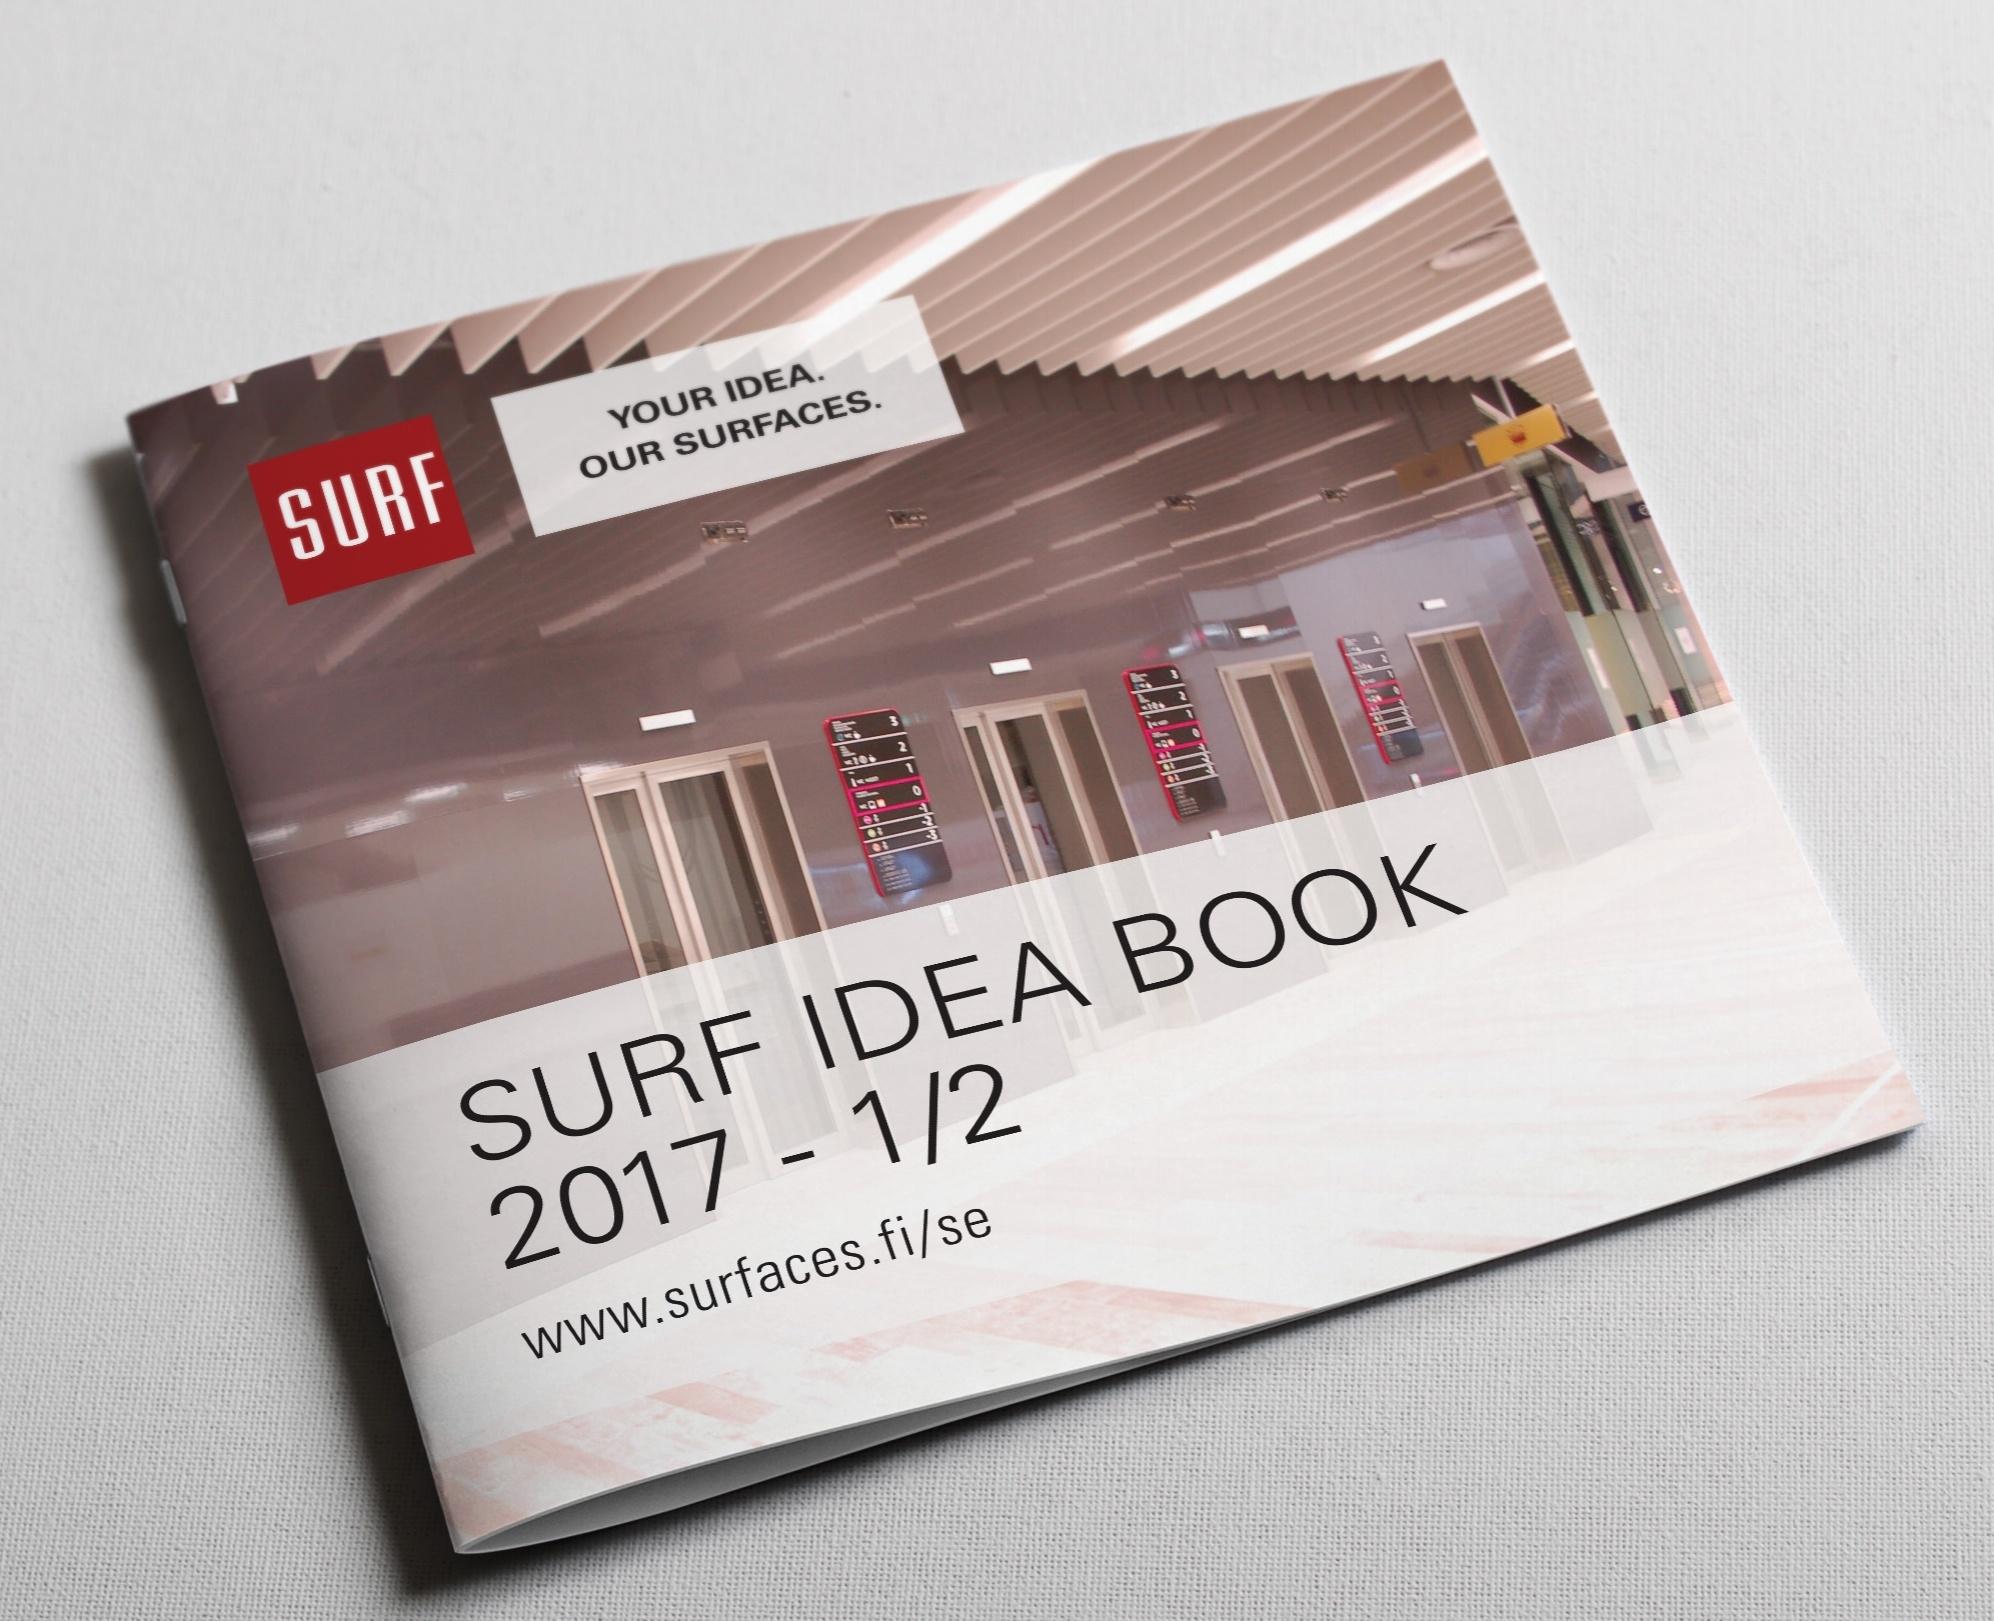 se-surf-idea-book-2017 (1)-682550-edited.jpg